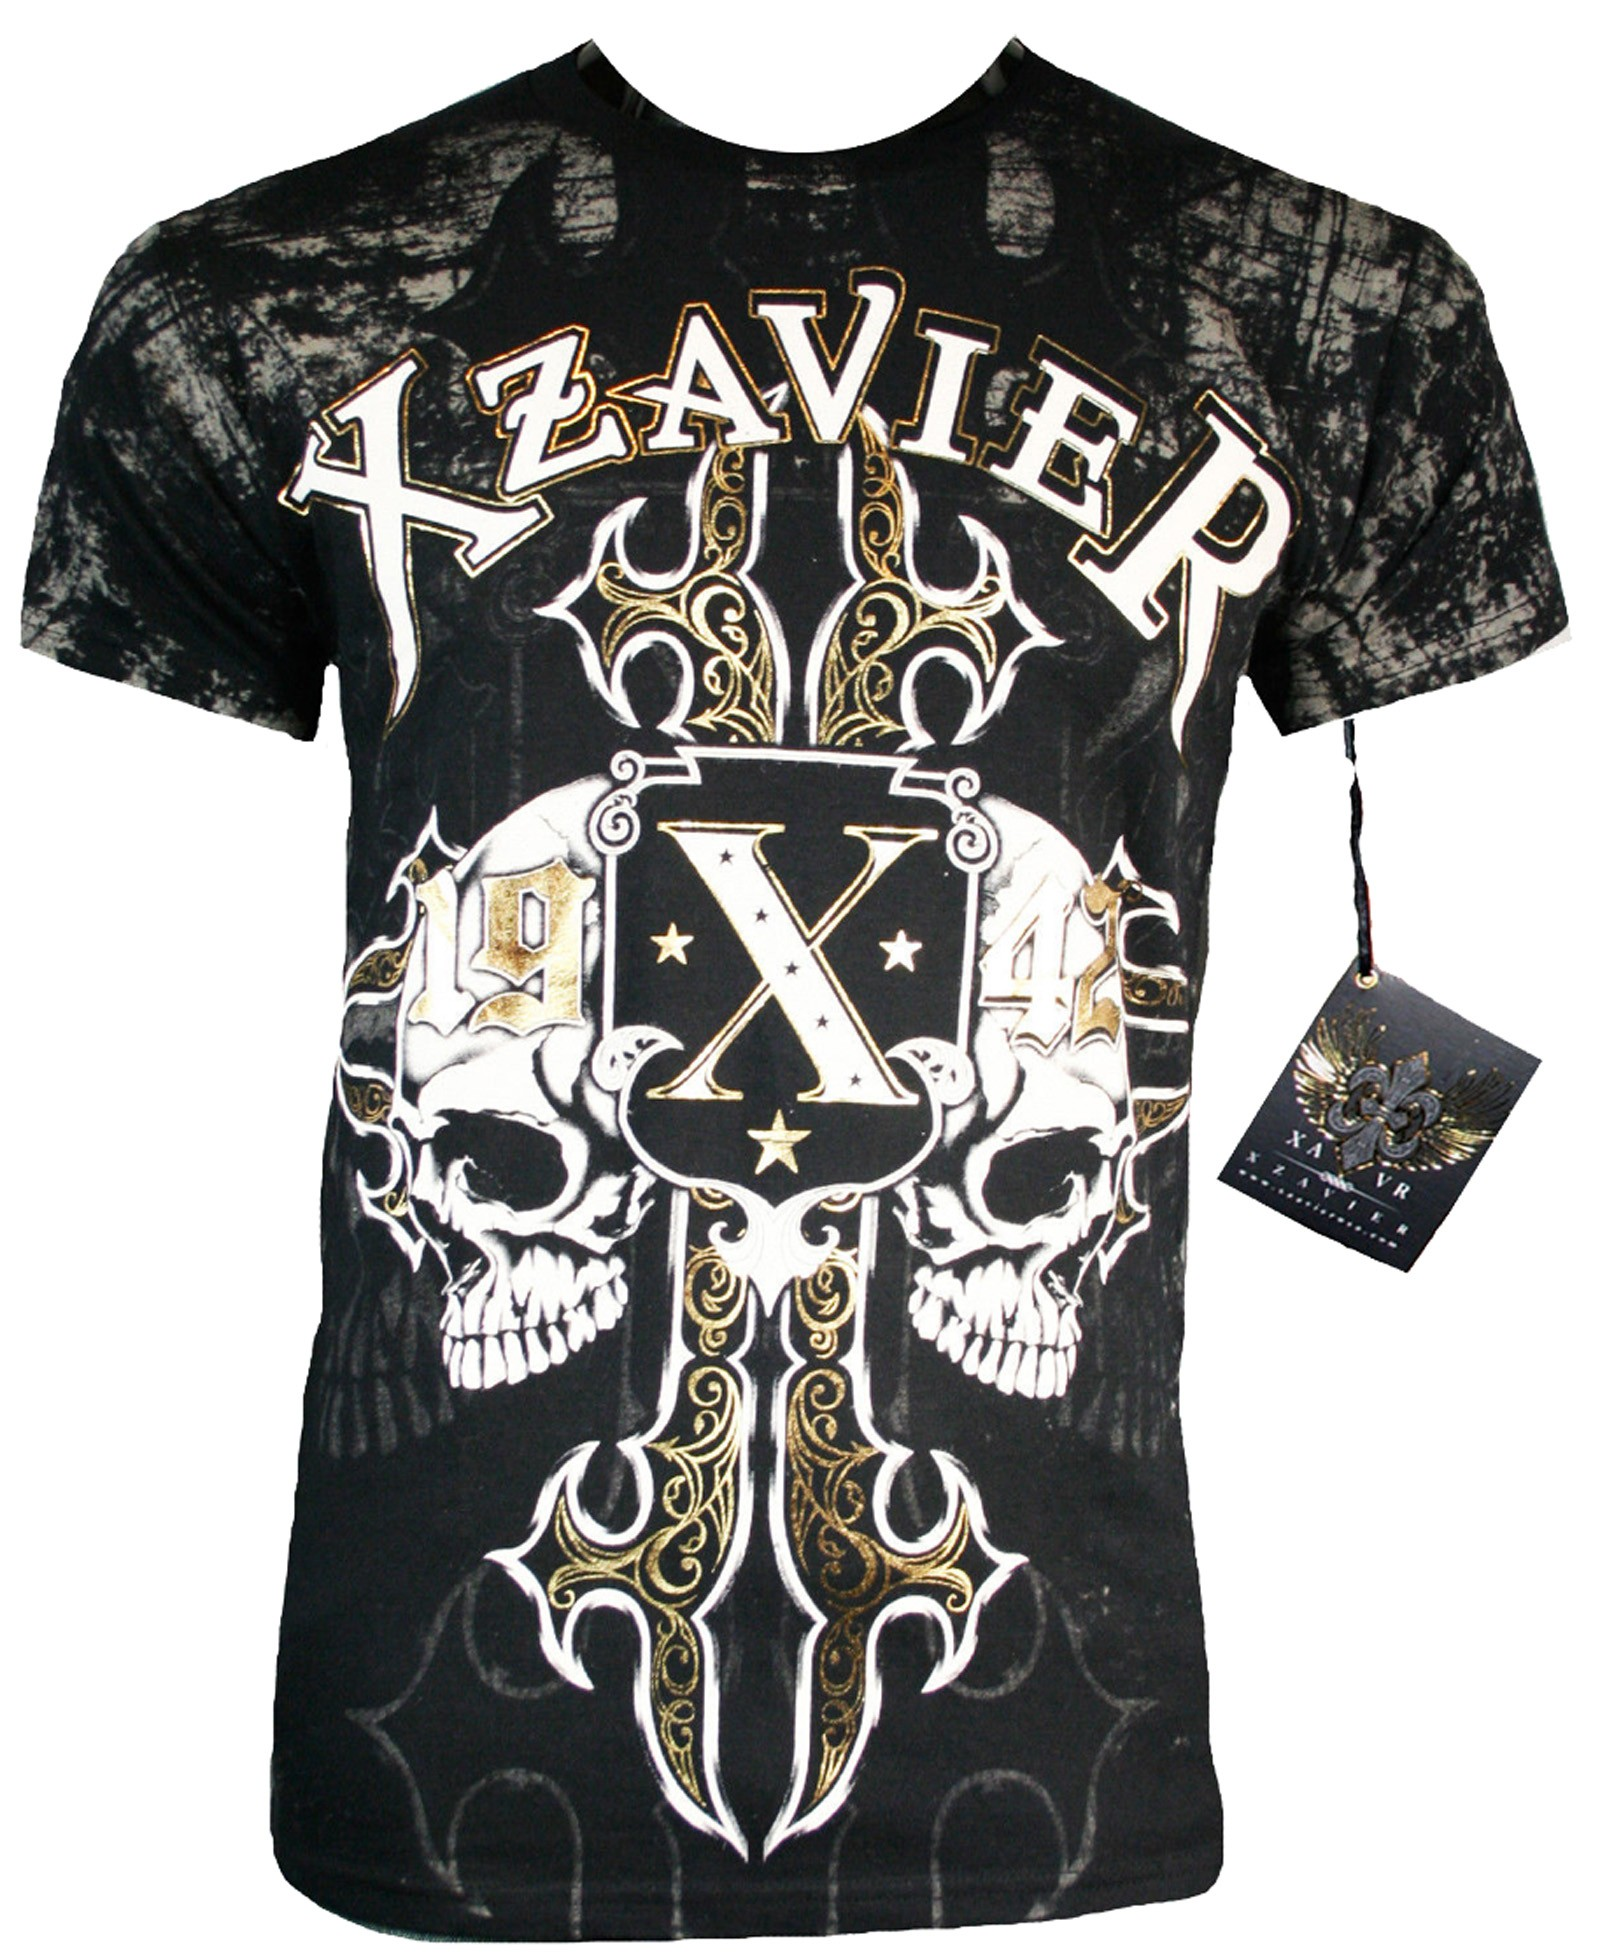 Xzavier - War Skulls T-Shirt Front